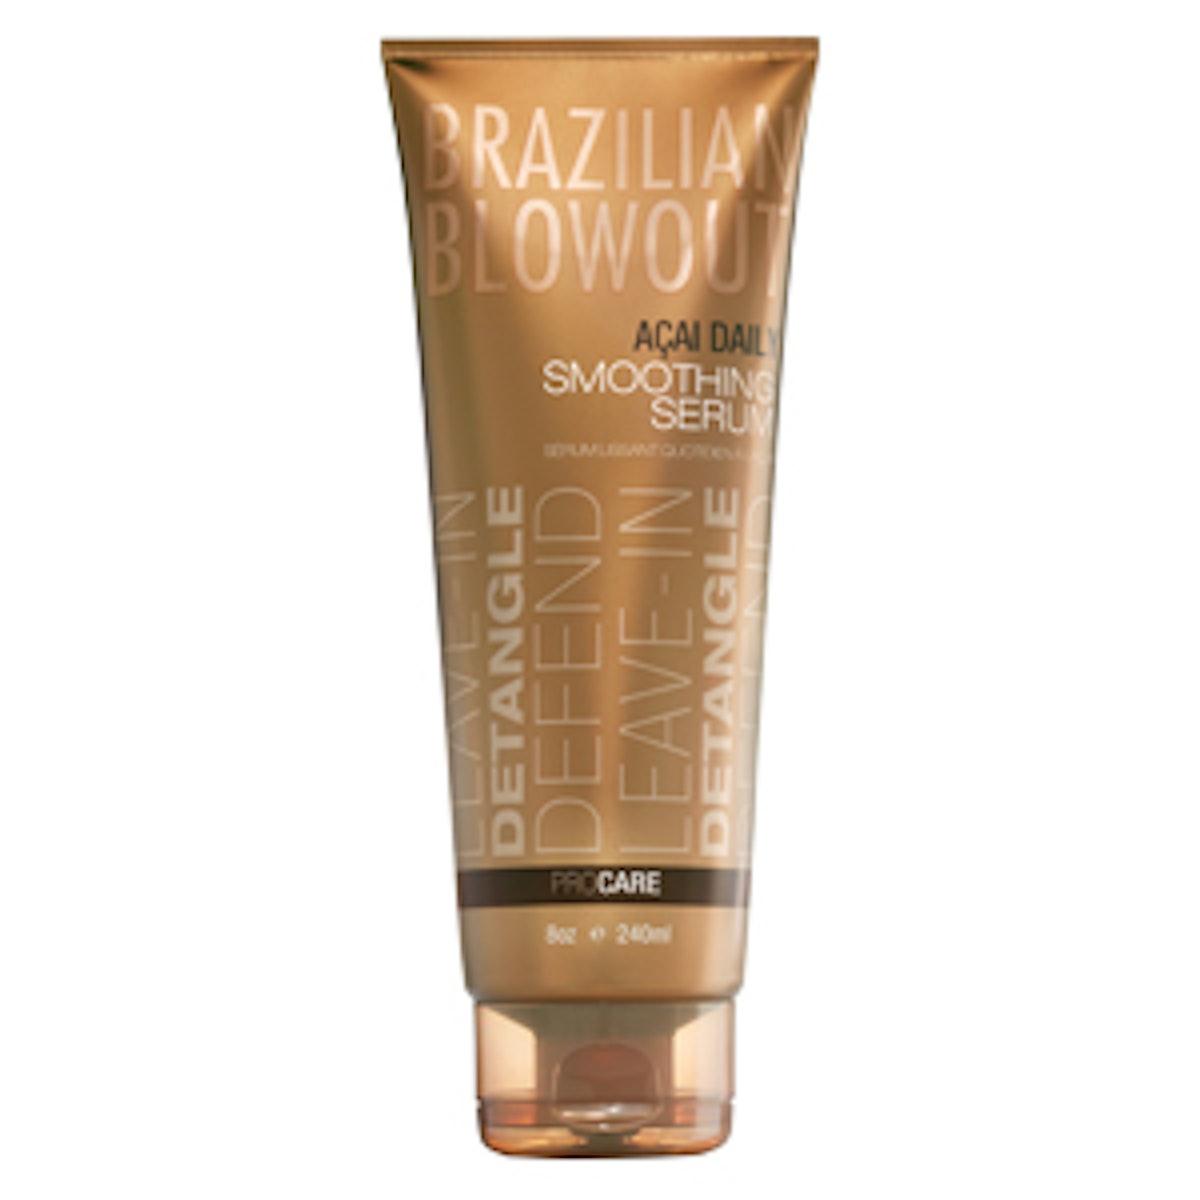 Brazilian Blowout Açai Daily Smoothing Serum